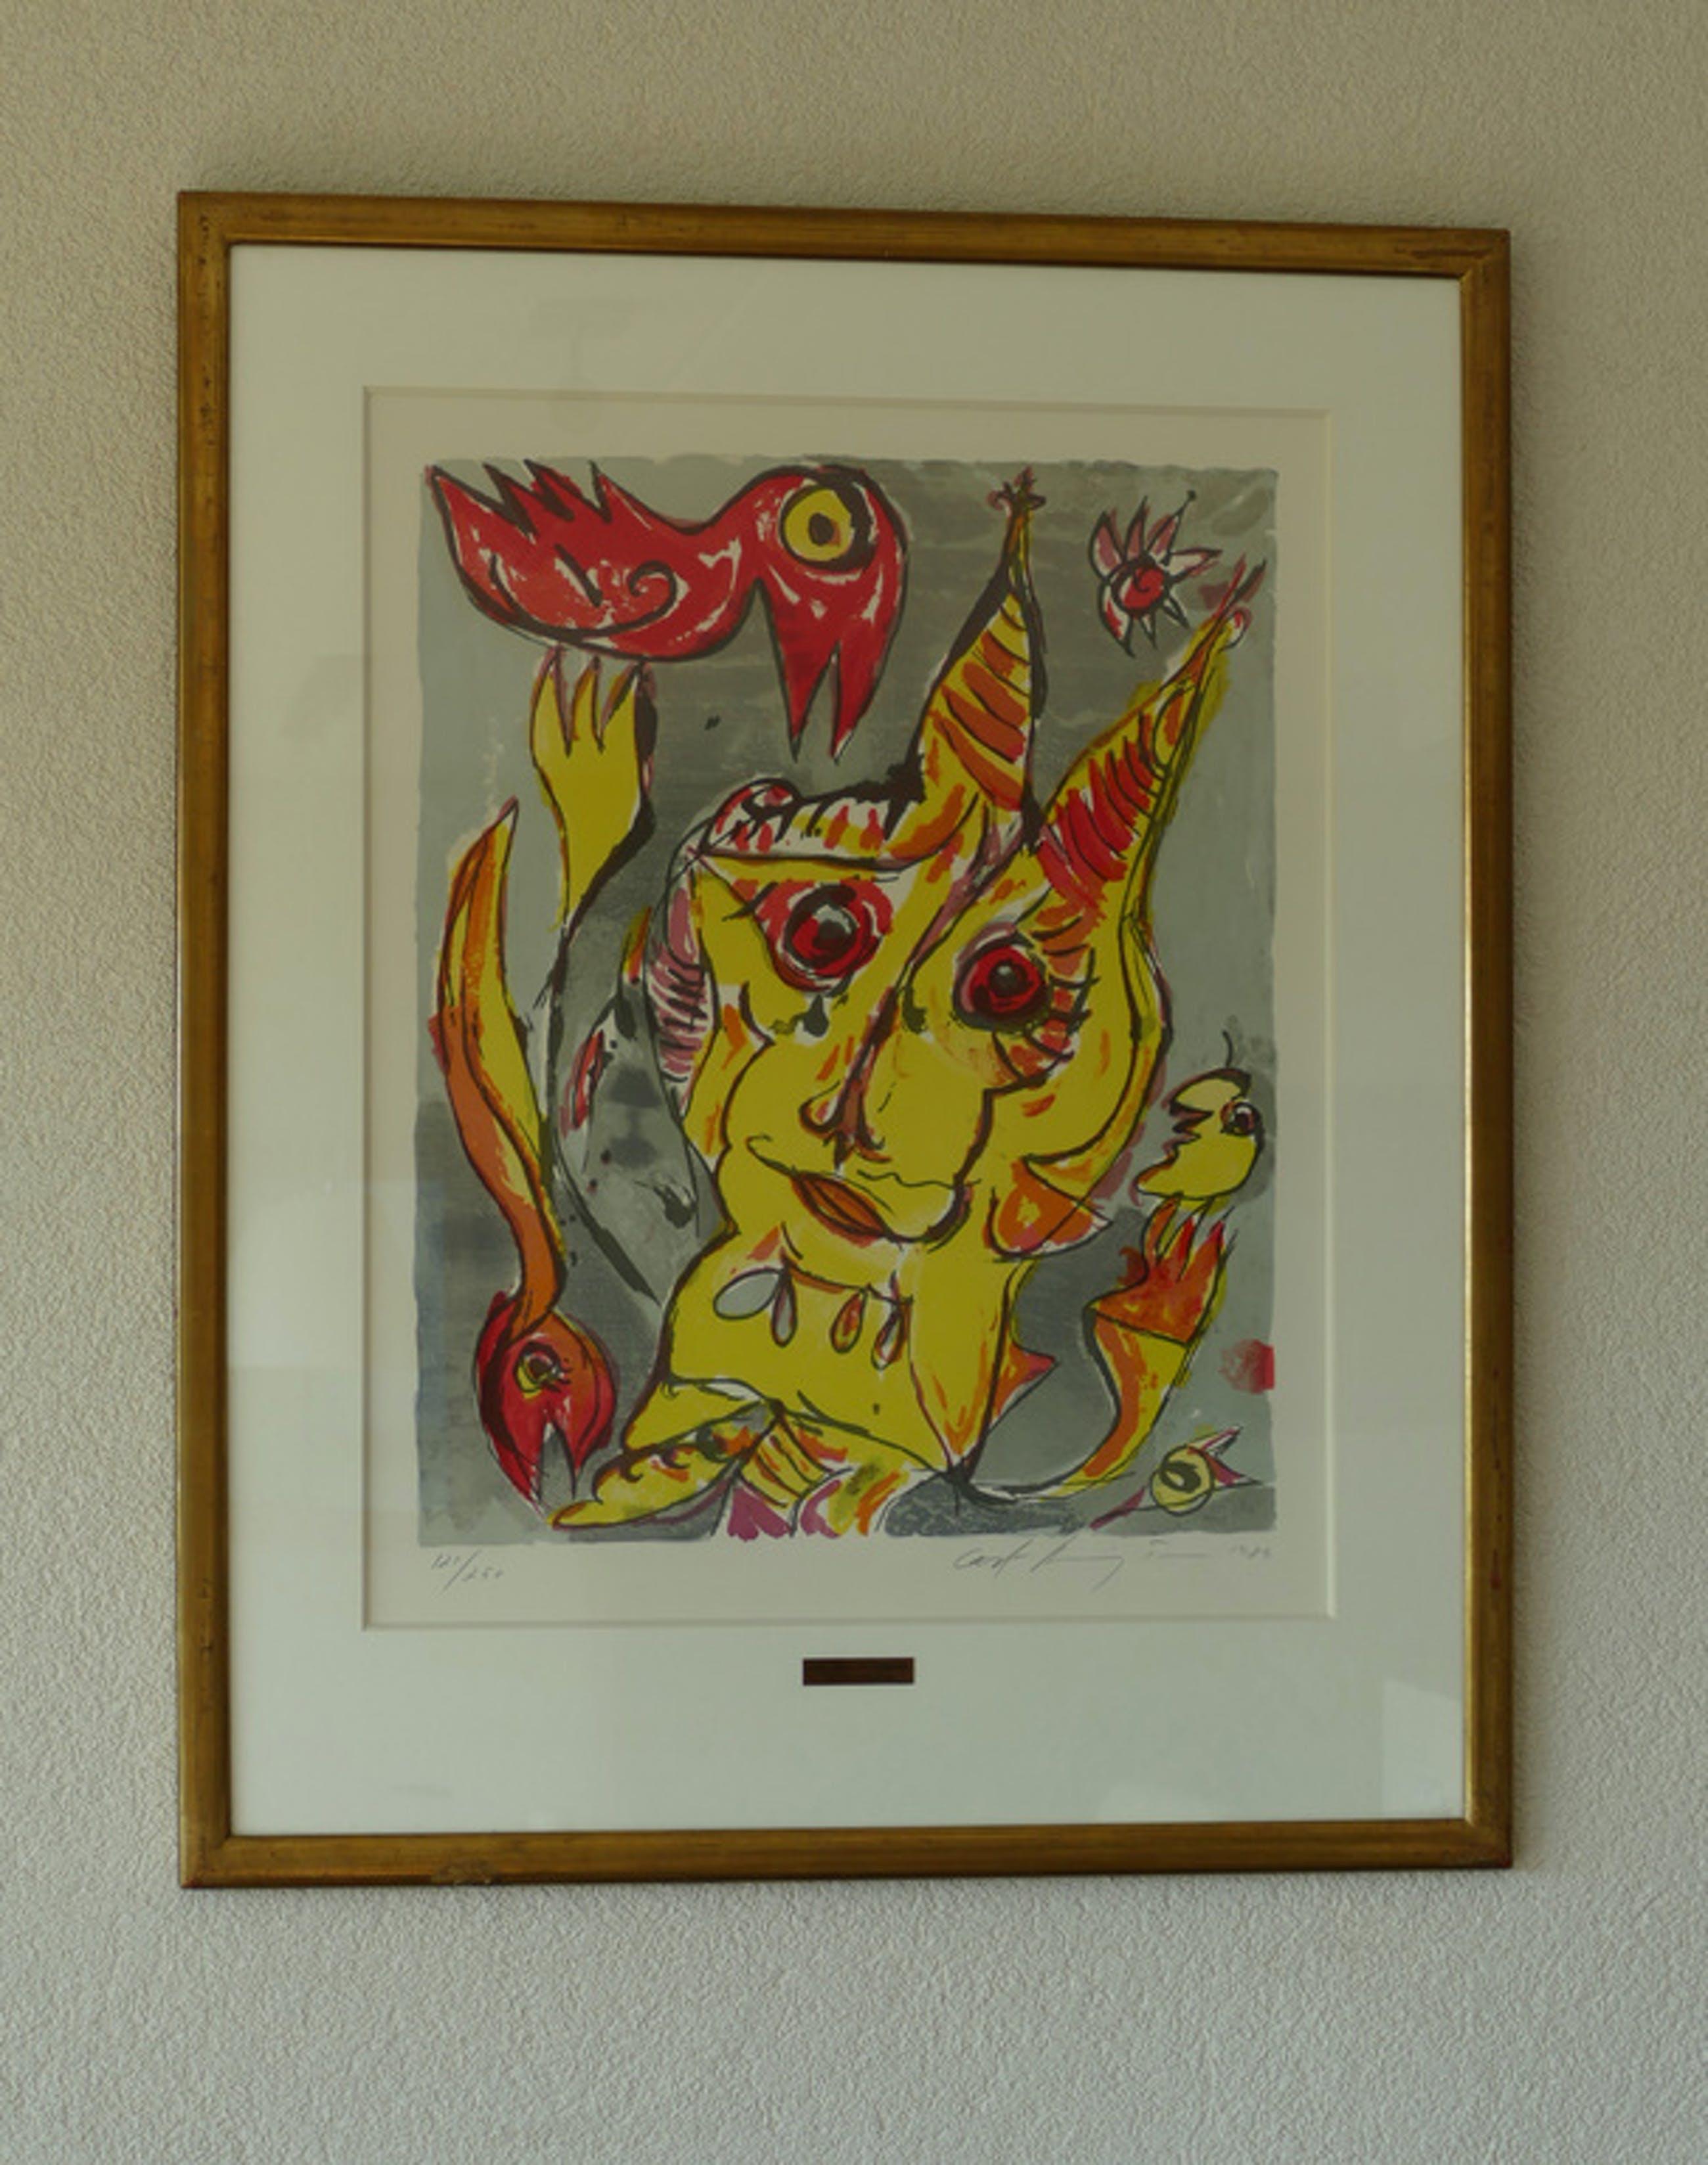 Carl Henning Pedersen - The Hill of the Elves - Kleurenlithografie  kopen? Bied vanaf 120!